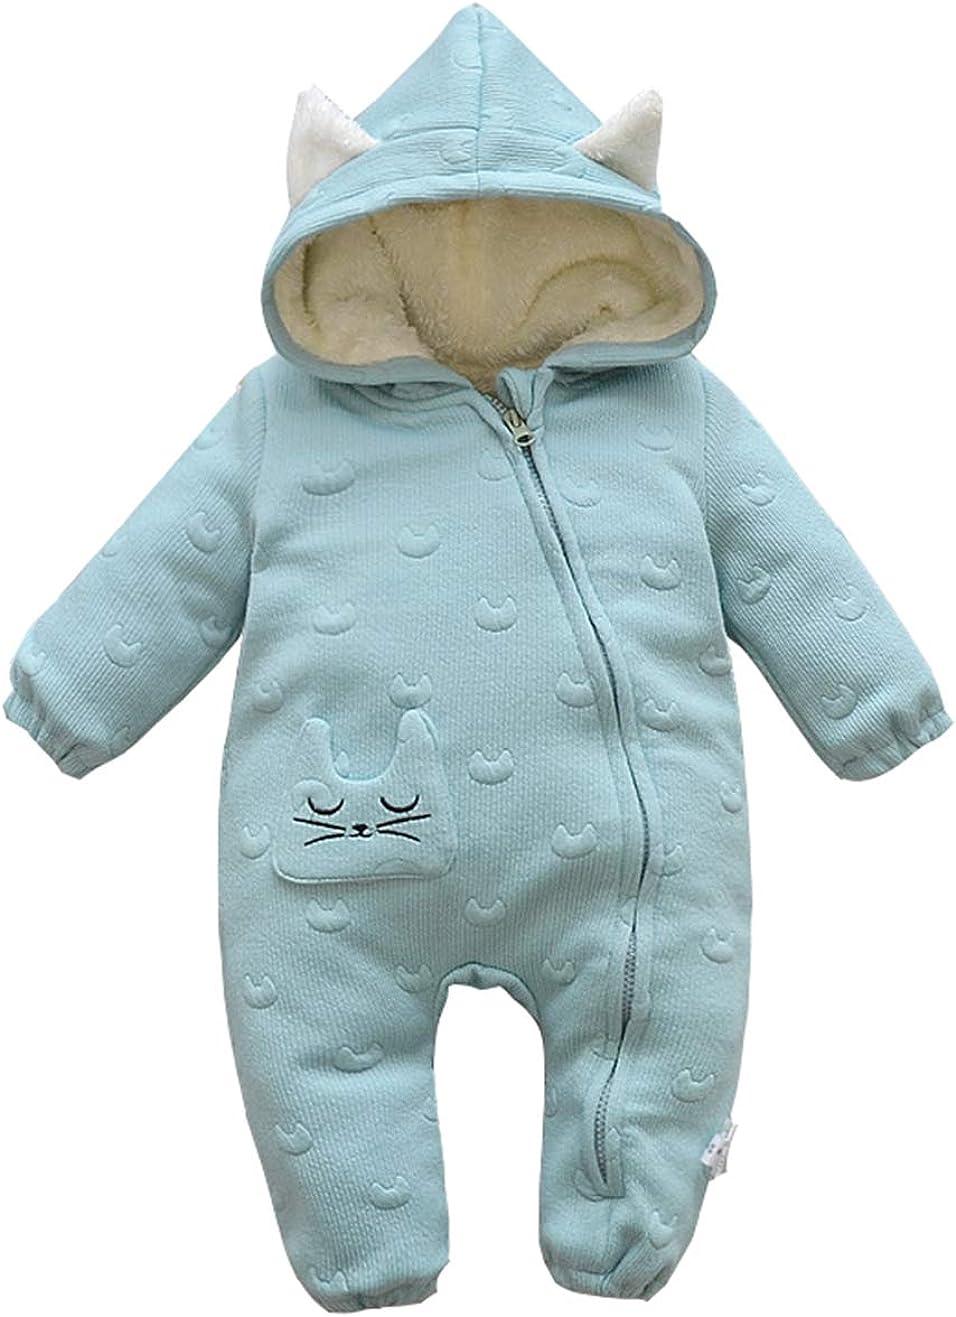 Fairy Baby Newborn Baby Unisex Cute Romper Outwear Winter Thick Snowsuit Fleece Jumpsuit